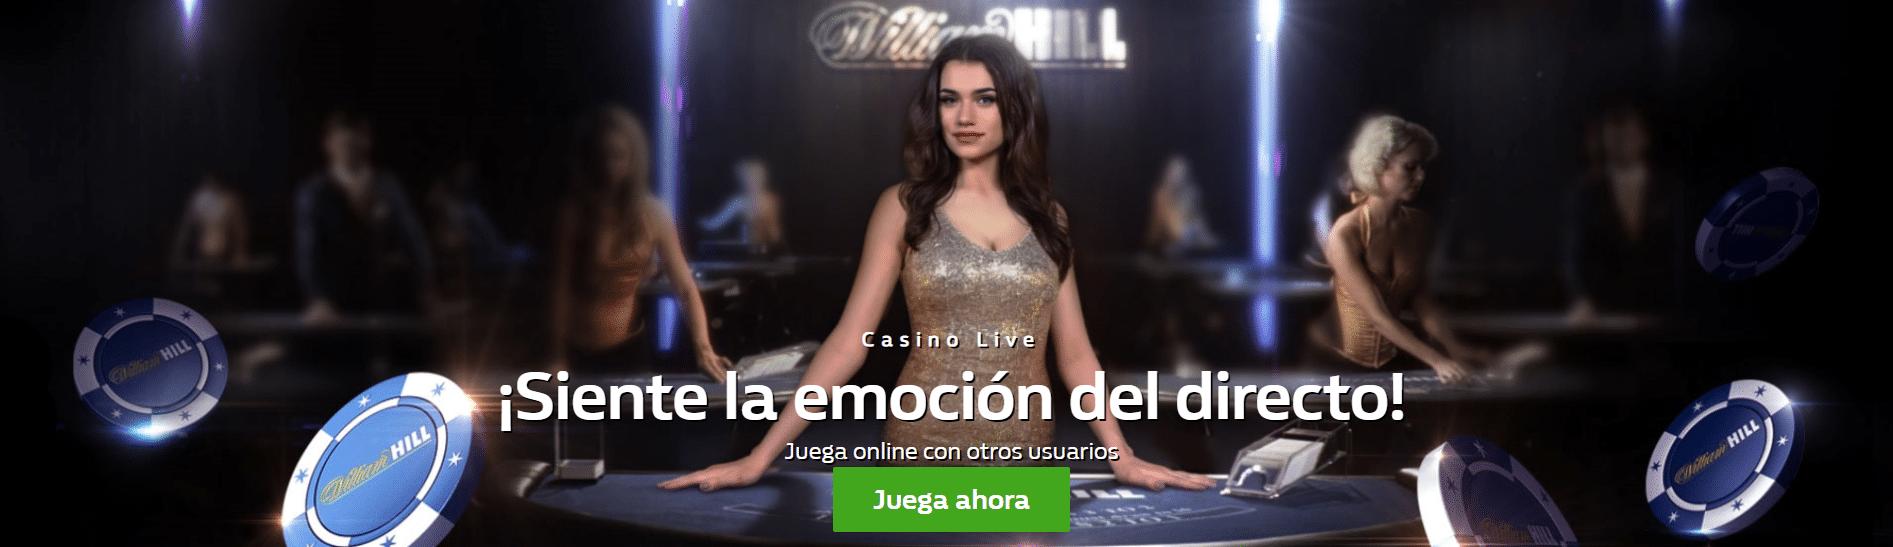 William Hill España Casino